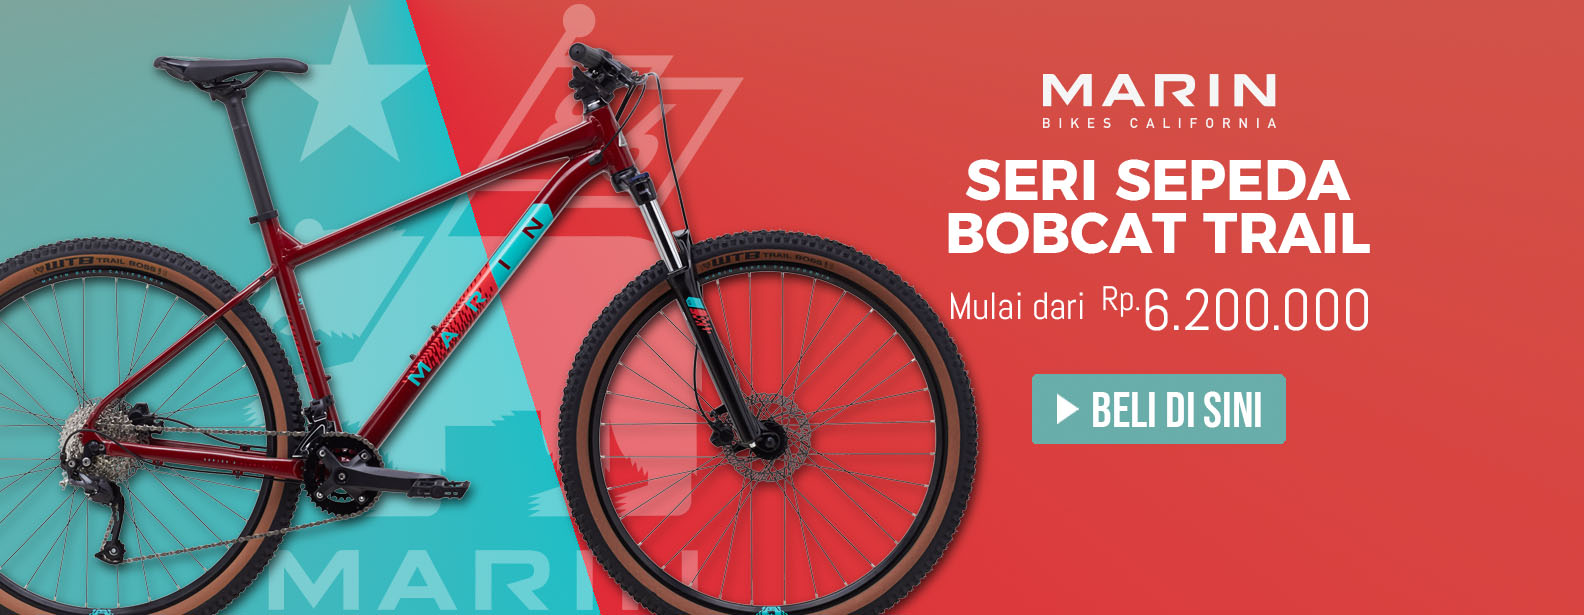 Koleksi Sepeda Marin Seri Bobcat